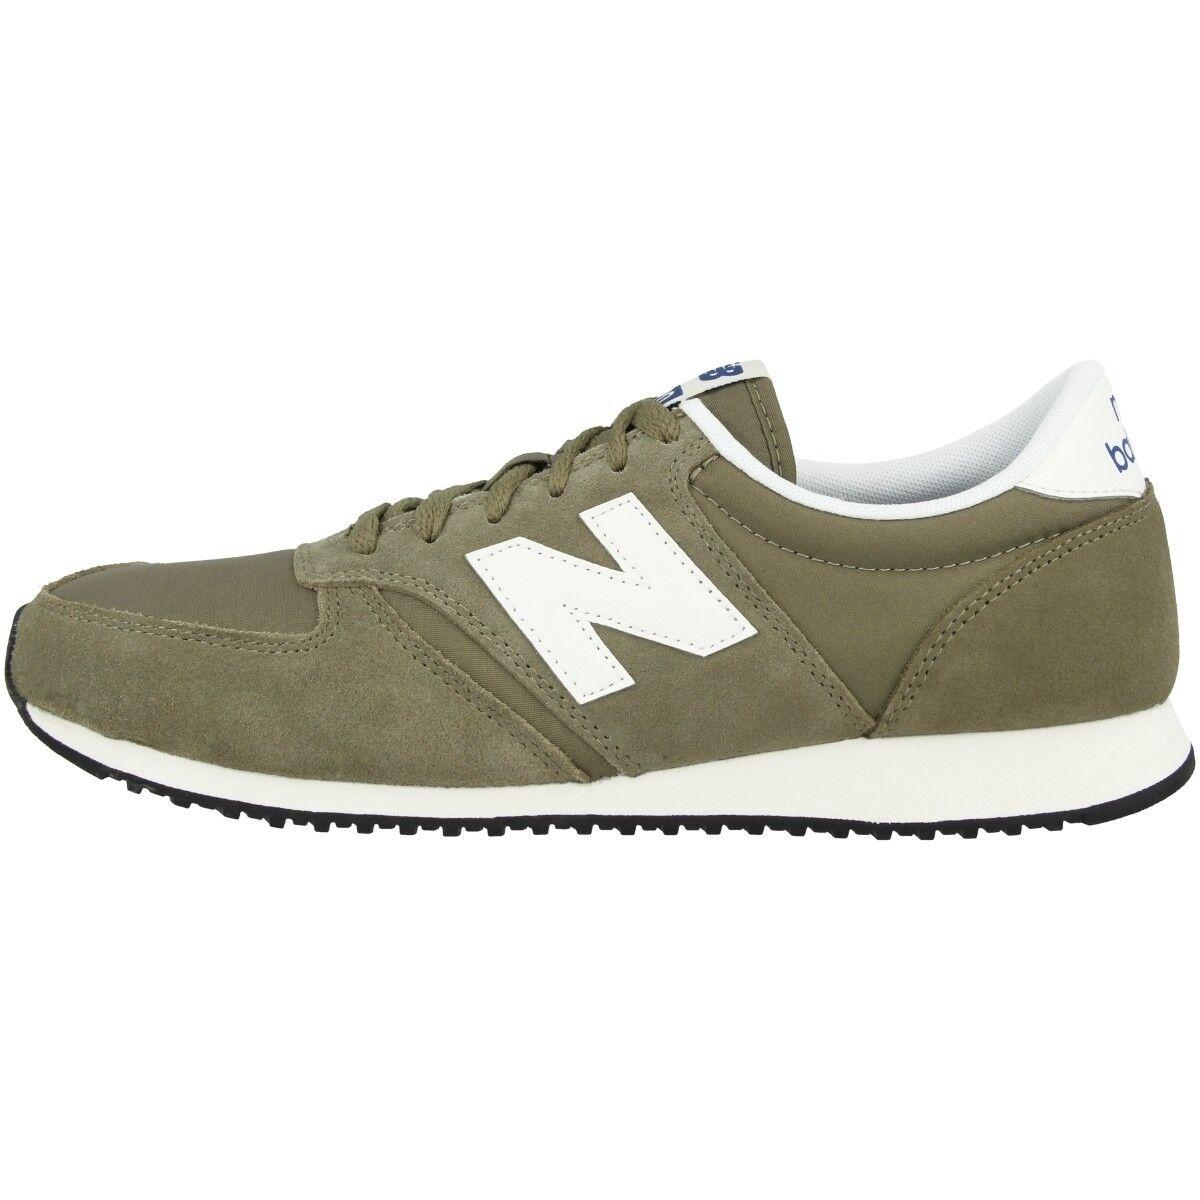 New Balance U 420 GRB Schuhe Freizeit Sneaker U420GRB Klassiker green off WEISS U420GRB Sneaker 004c62